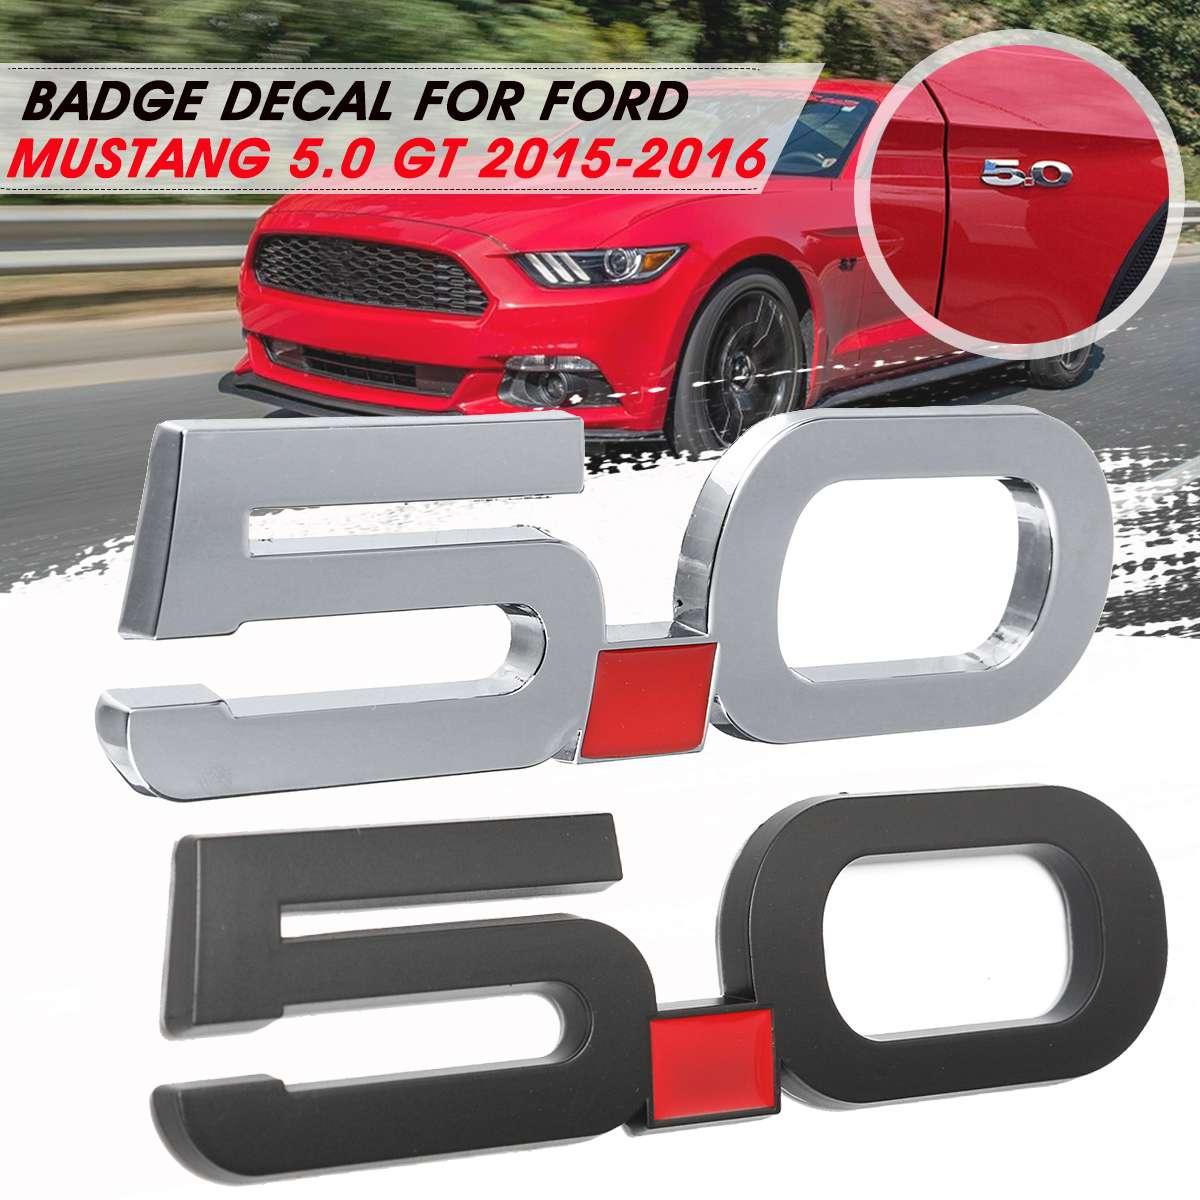 Metal Car 5.0 Decal Sticker Cover for Fender Emblem Bandage Decoration For Ford/Mustang 5.0 GT 2015 2016